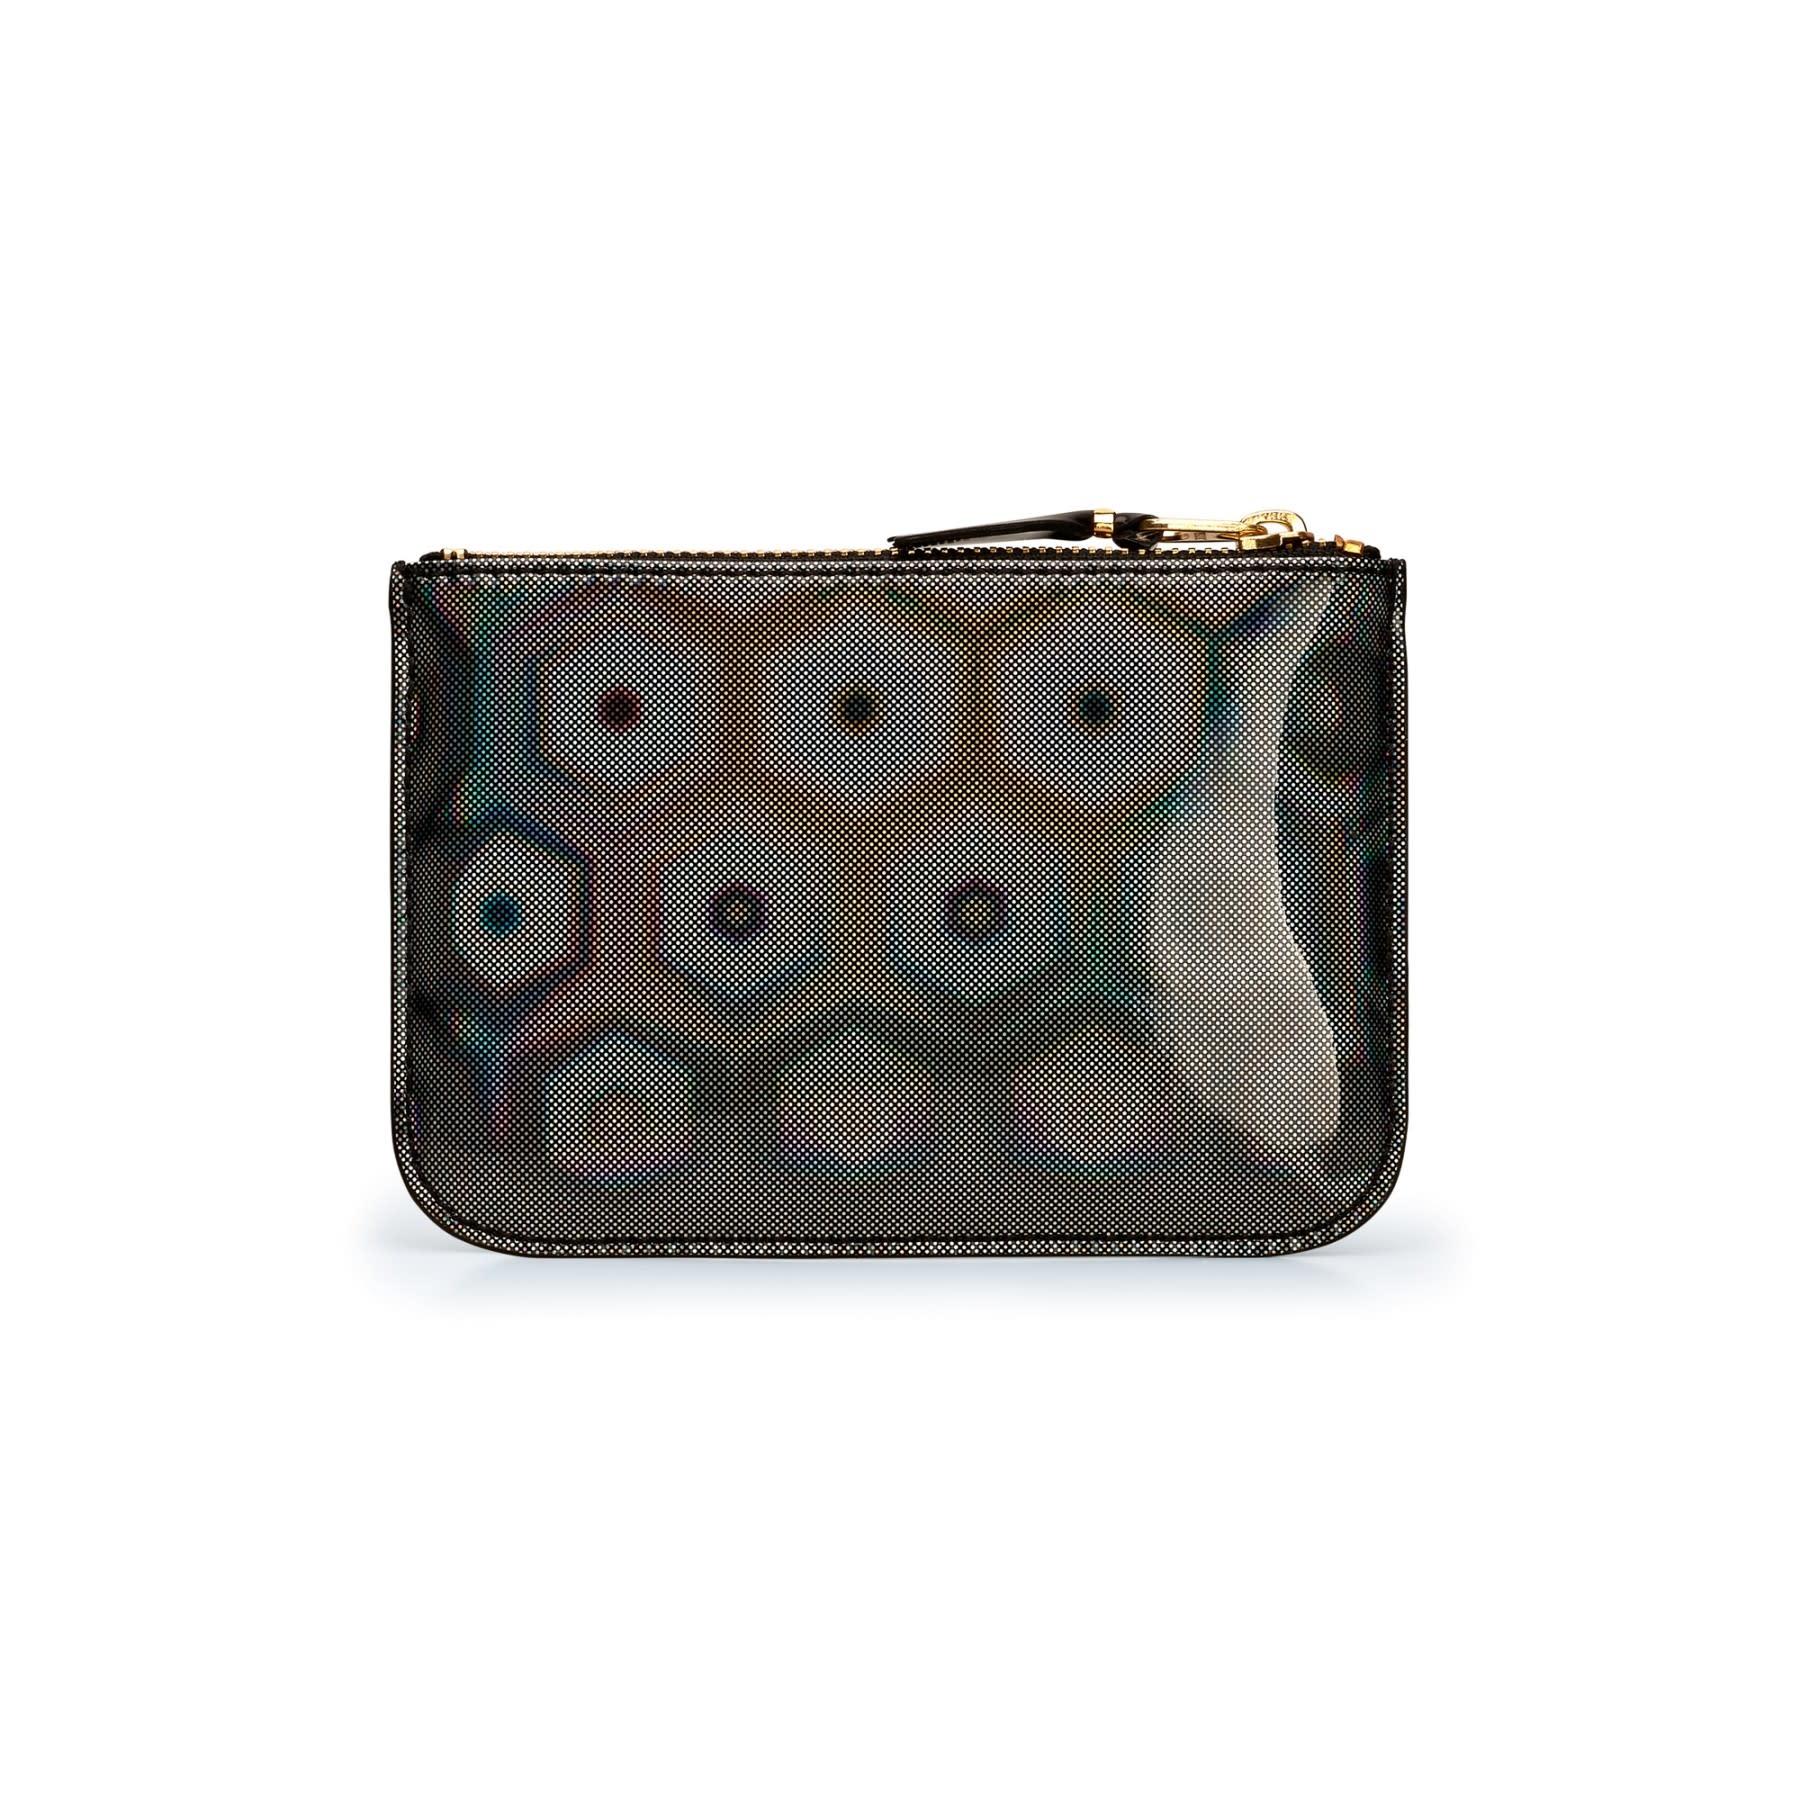 COMME des GARÇONS WALLET small zip pouch in Black Rainbow Hologram